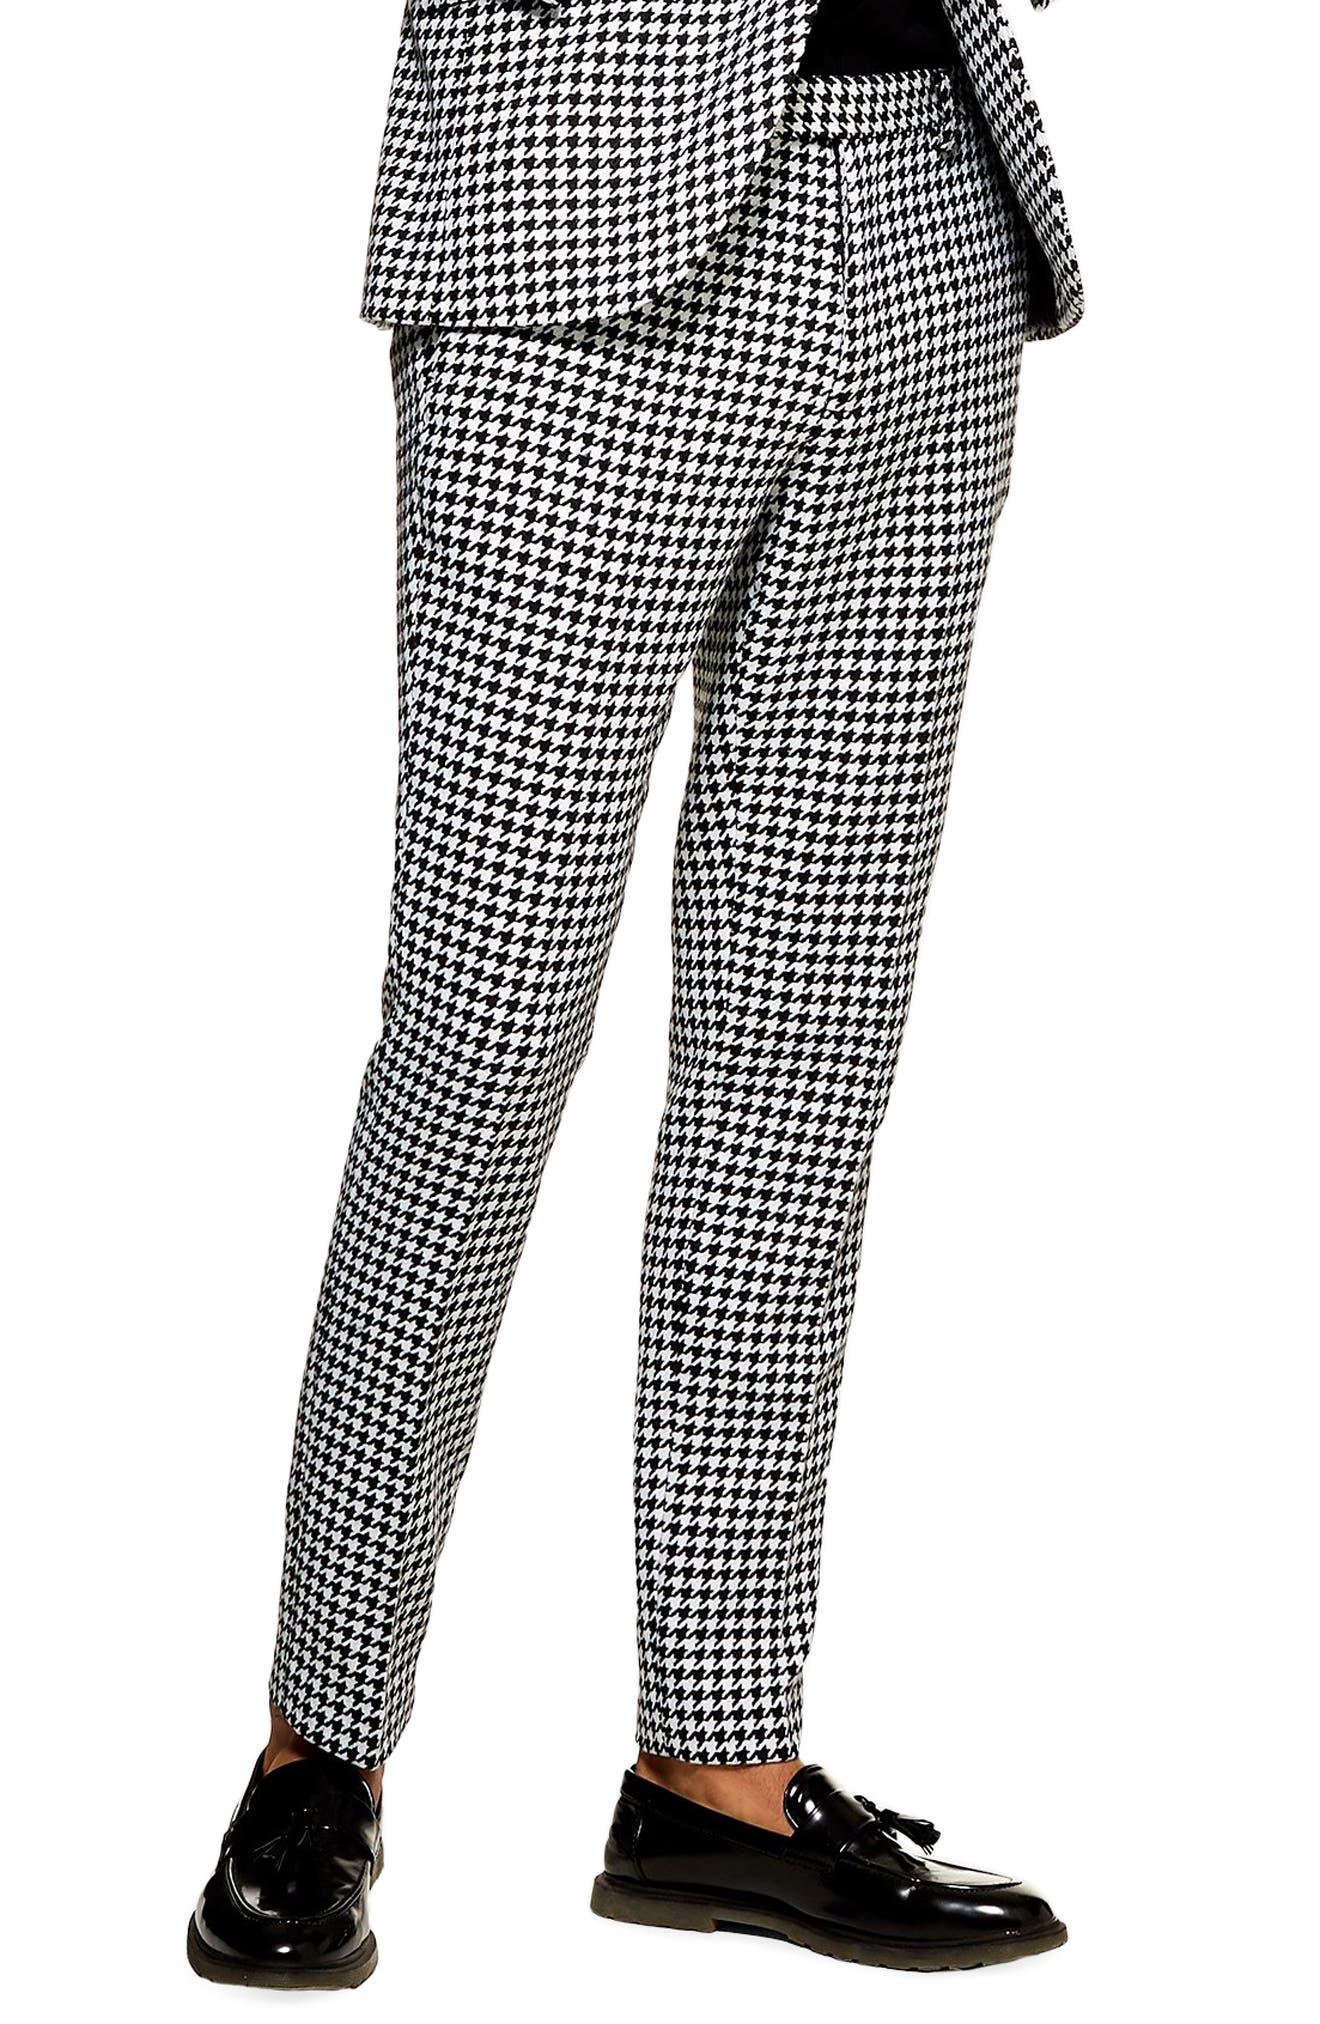 TOPMAN, Roe Skinny Fit Trousers, Main thumbnail 1, color, 001